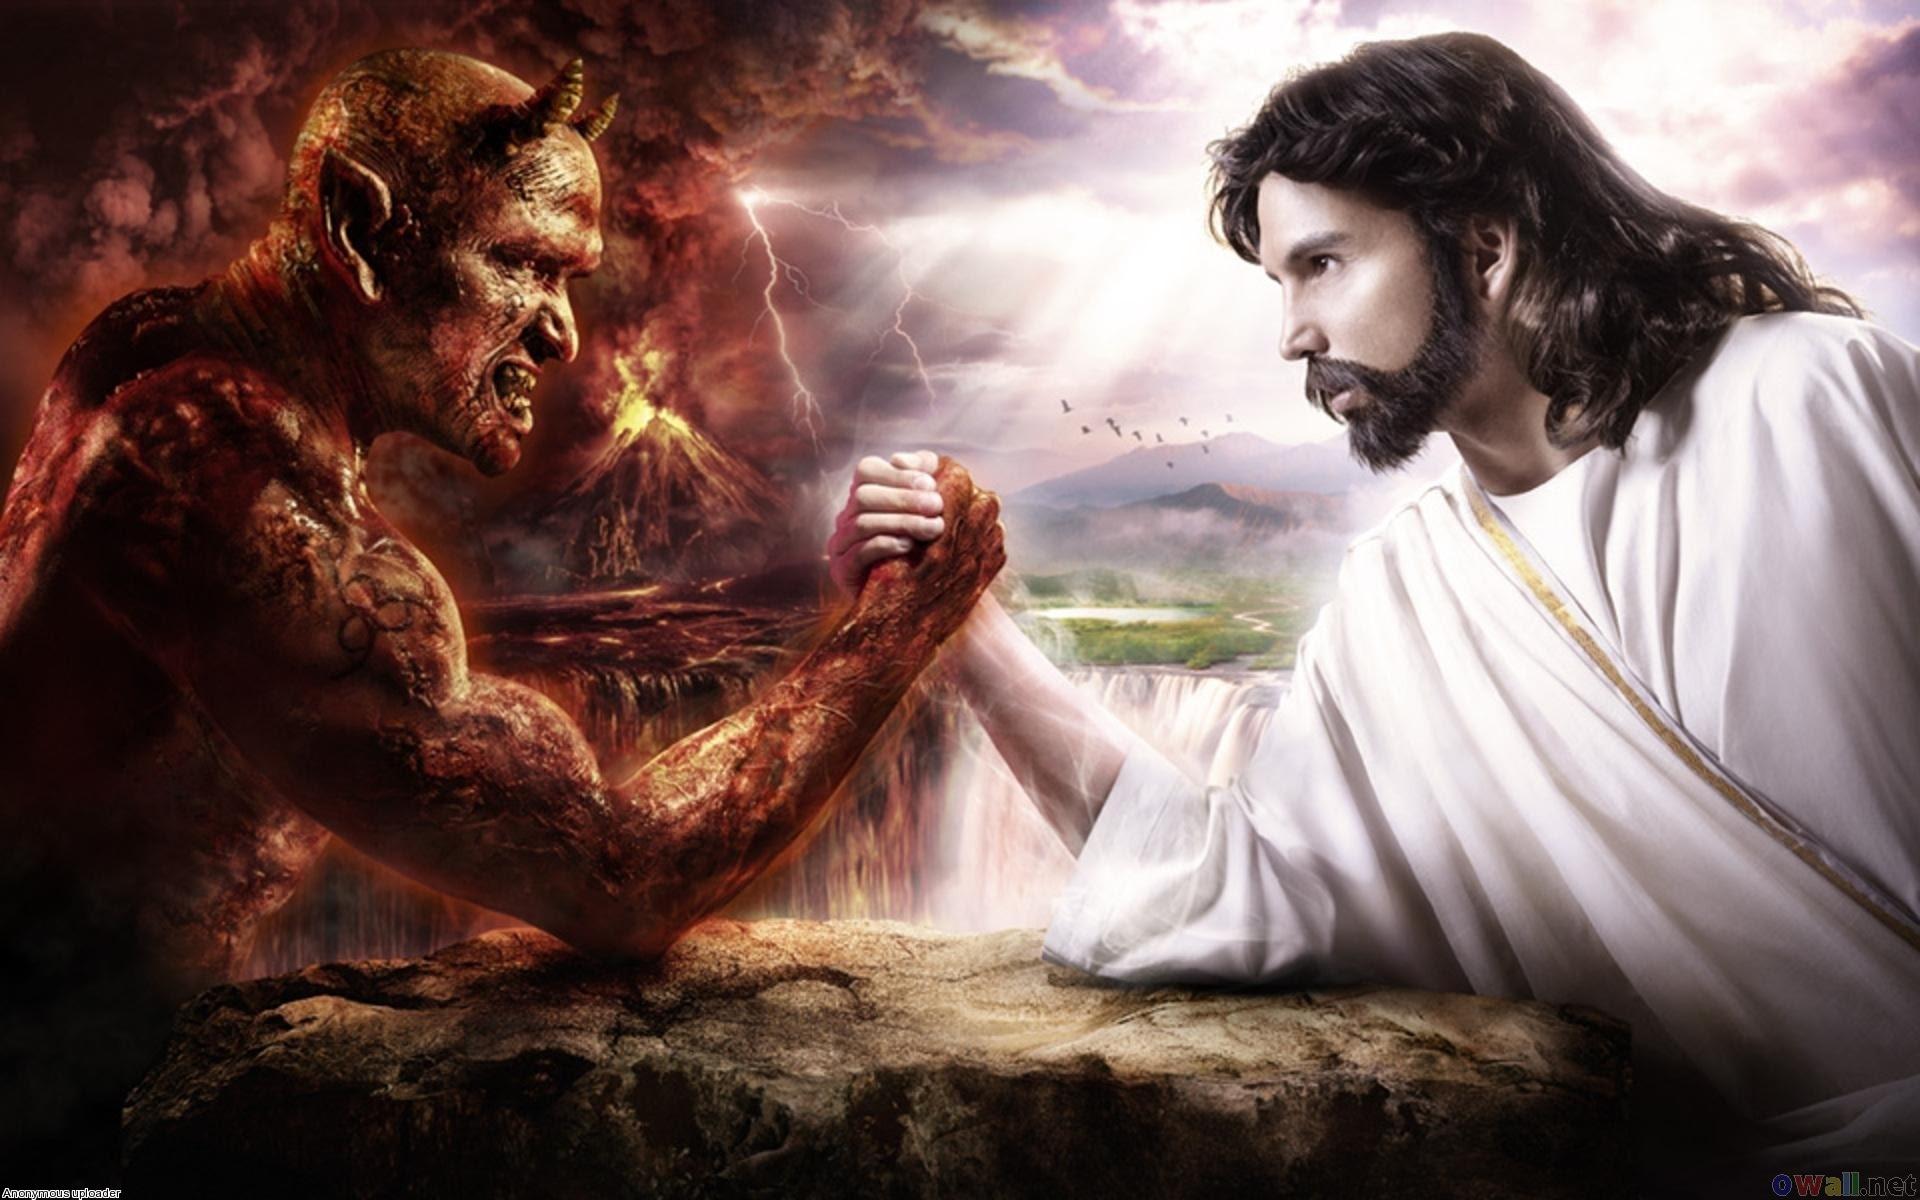 http://richhillenjr.files.wordpress.com/2011/04/0jesus_vs_satan_1920x1200.jpg